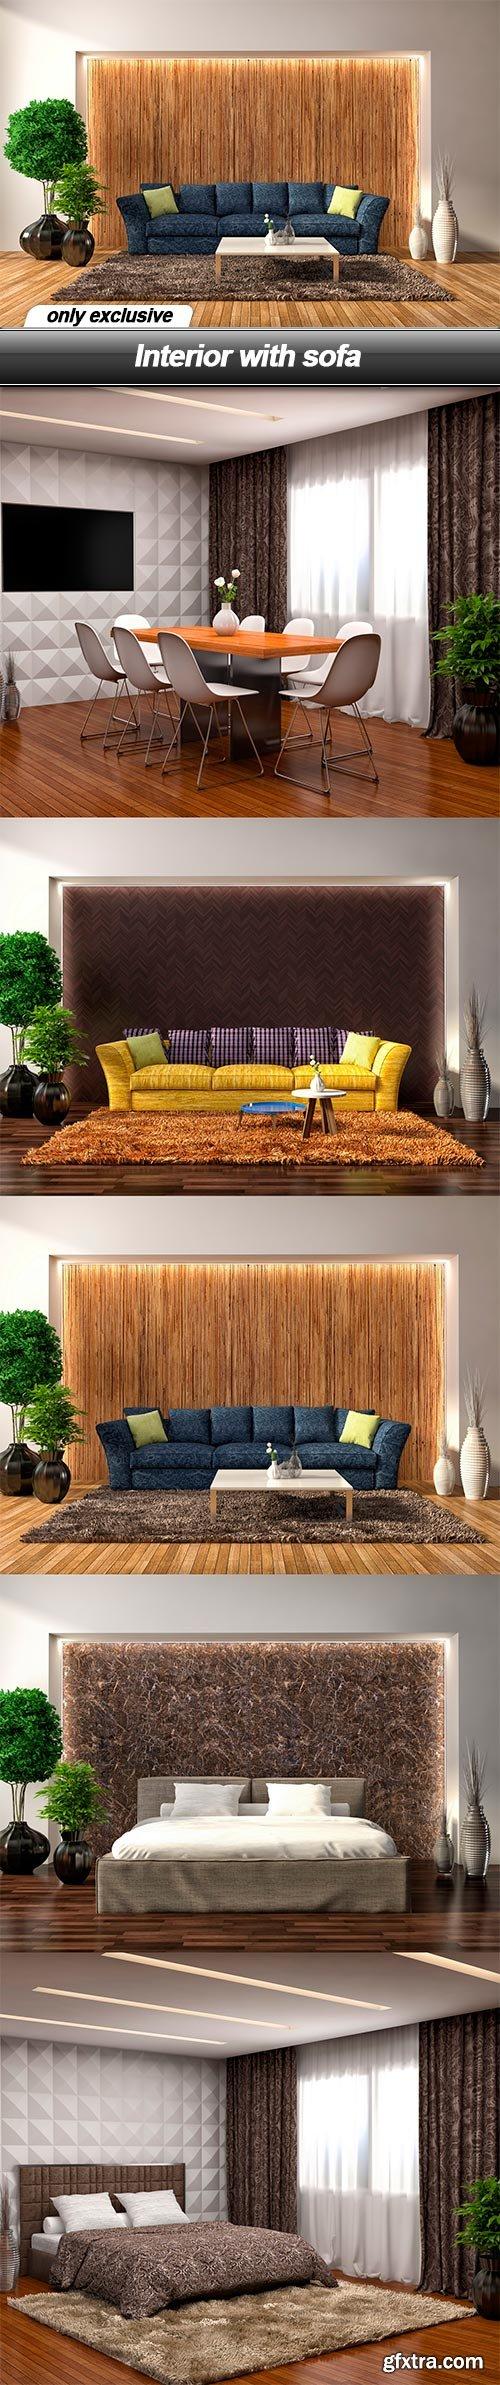 Interior with sofa - 5 UHQ JPEG